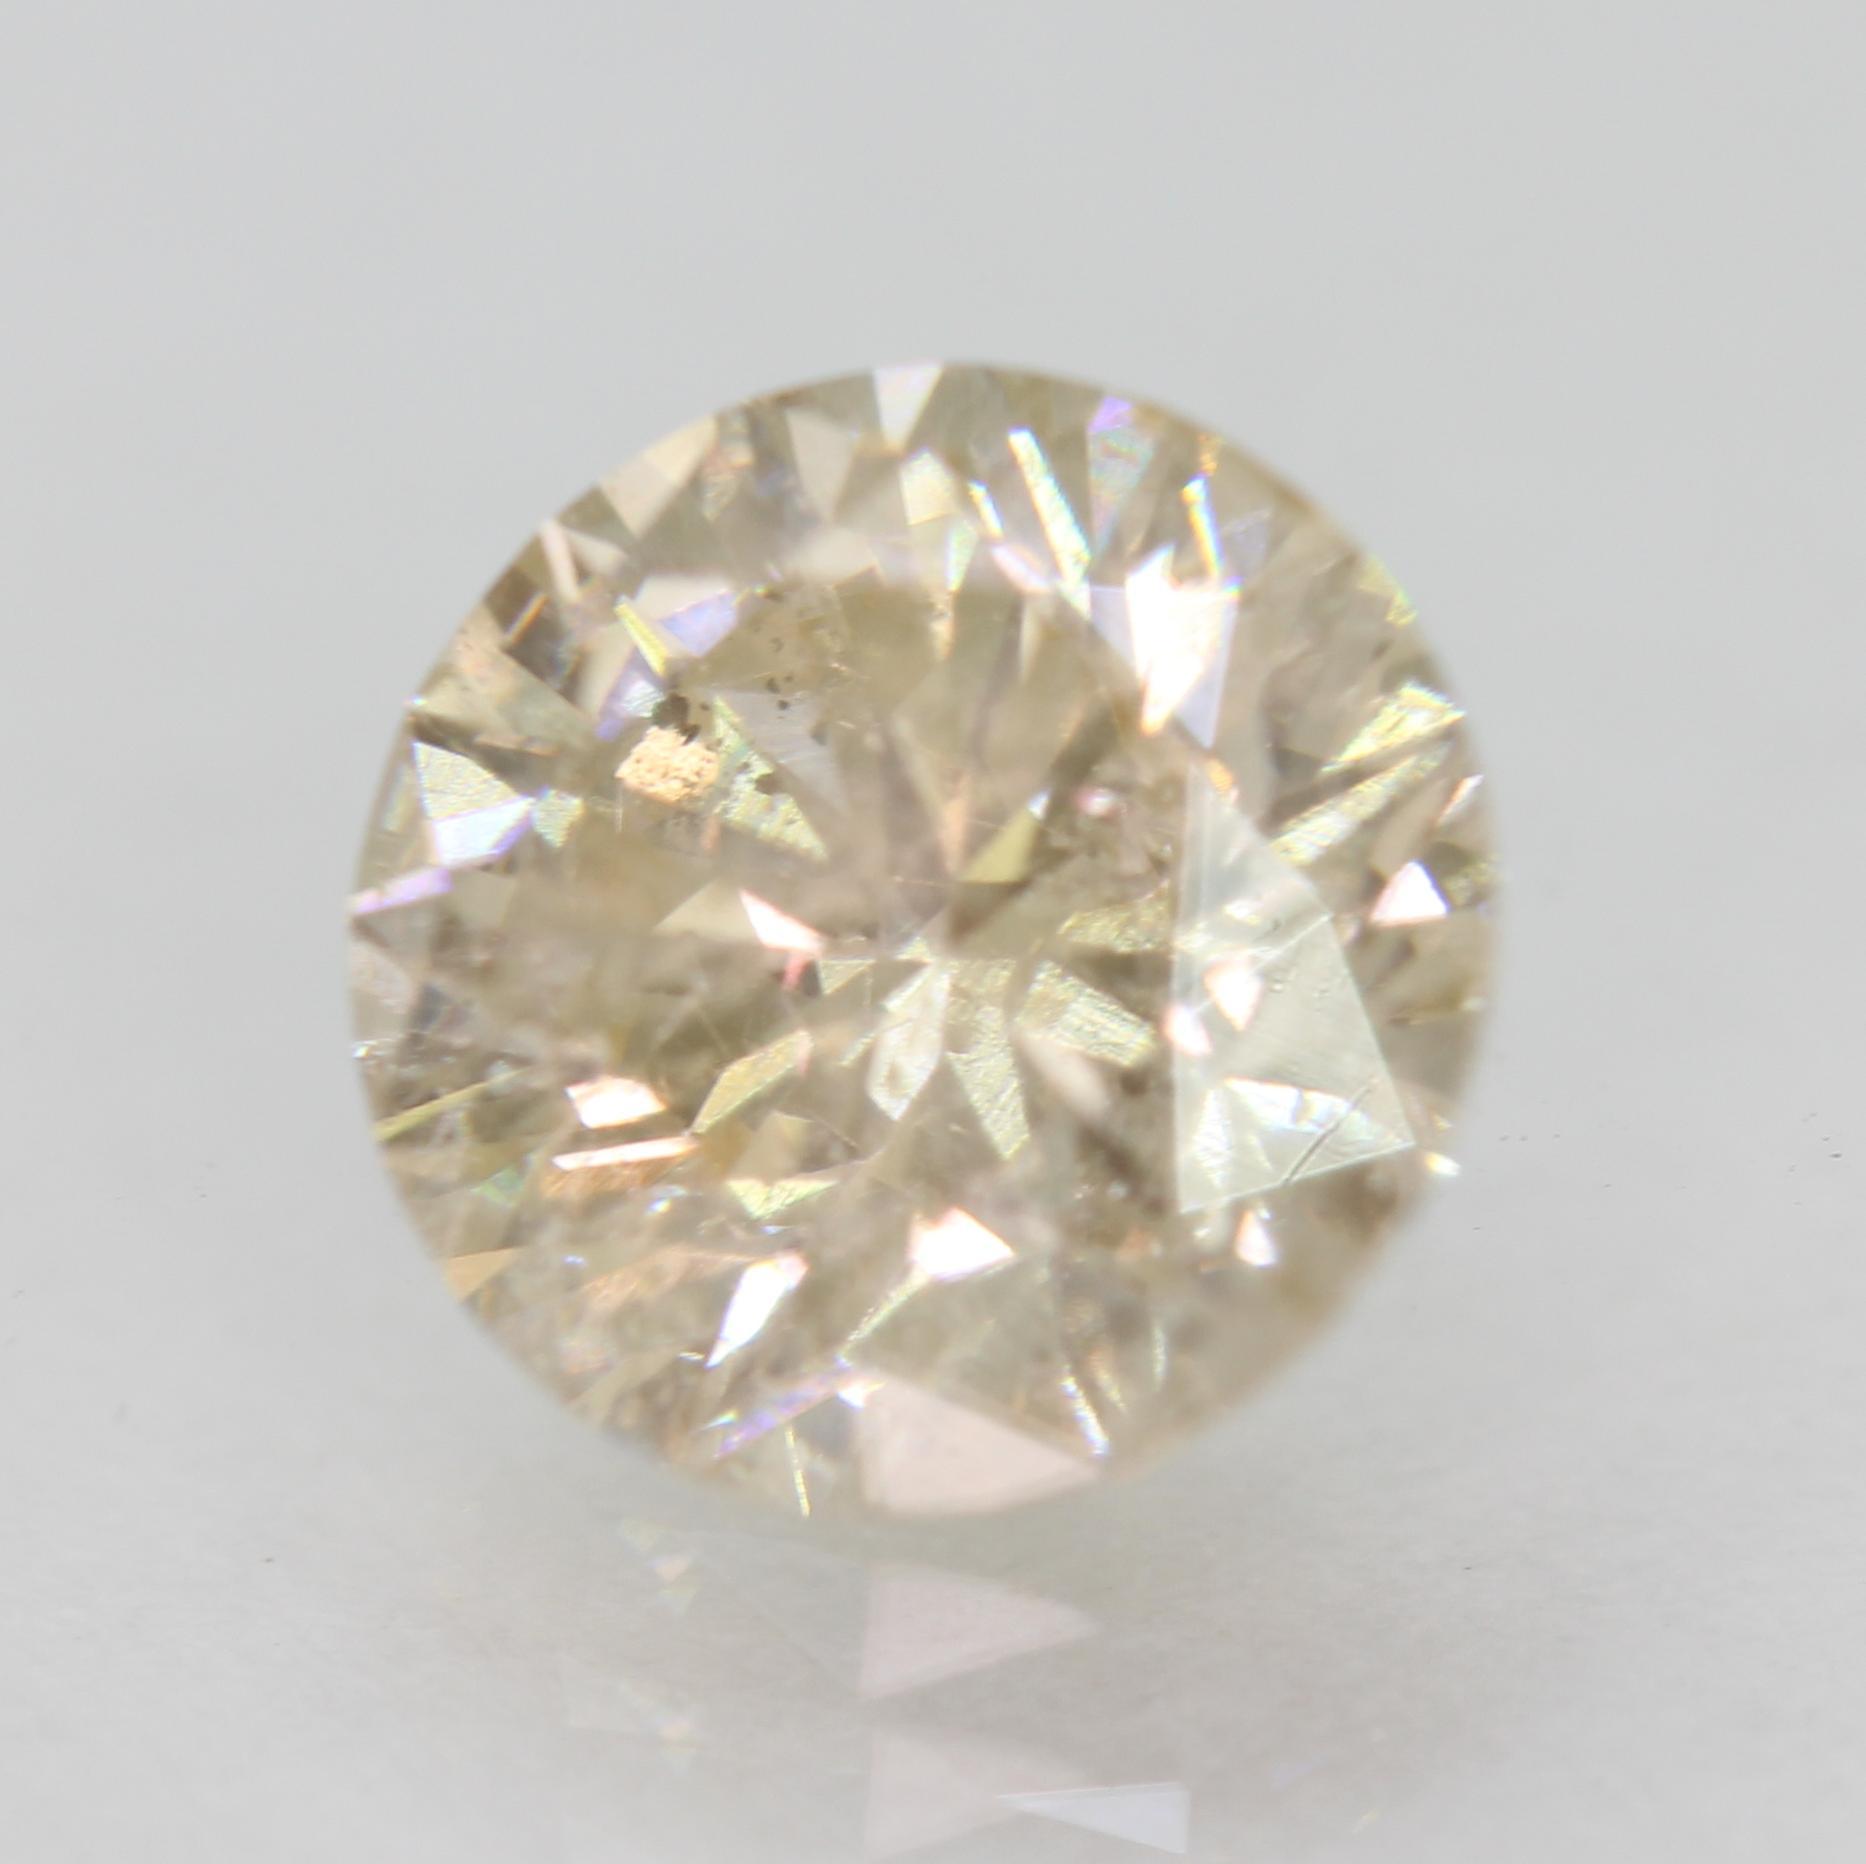 Certified 1.65 Carat L SI2 Round Brilliant Enhanced Natural Loose Diamond 7.45mm